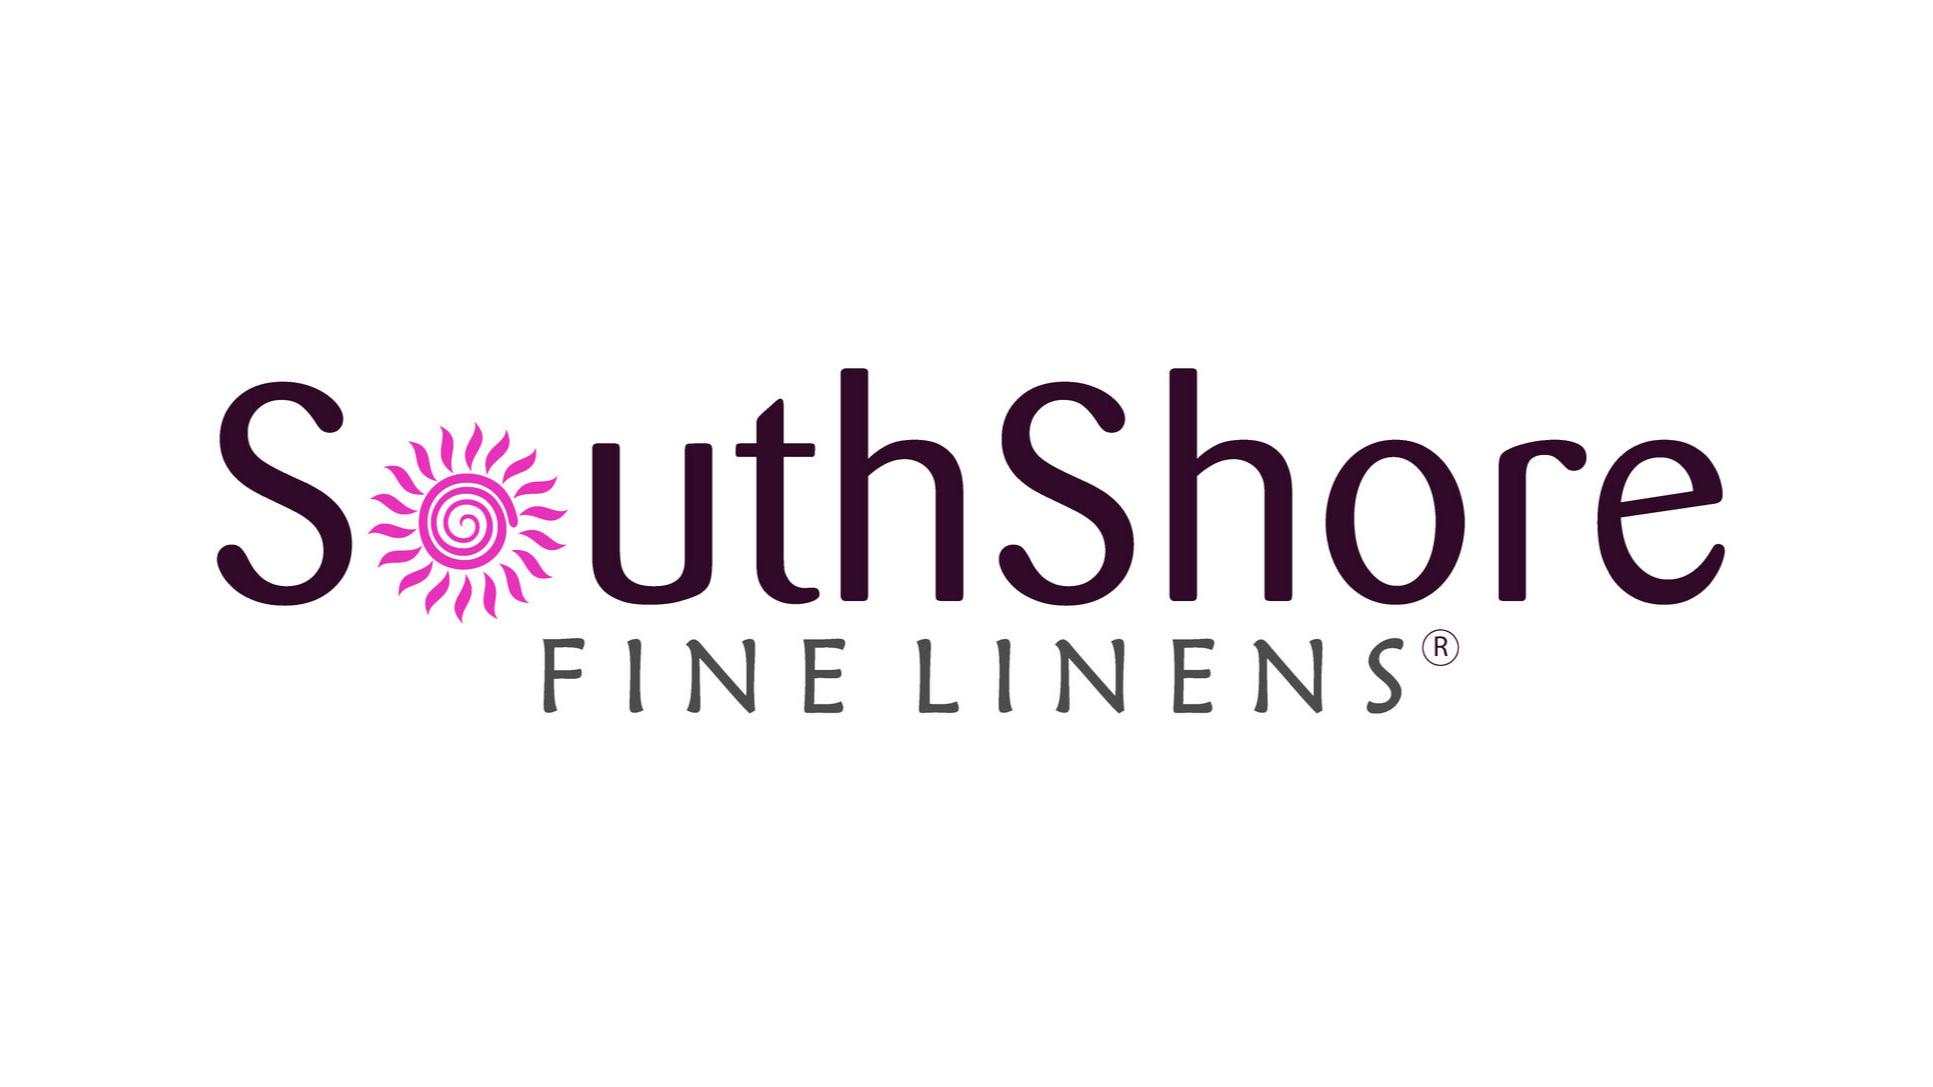 SouthShore Fine Linens_White_BG.jpg